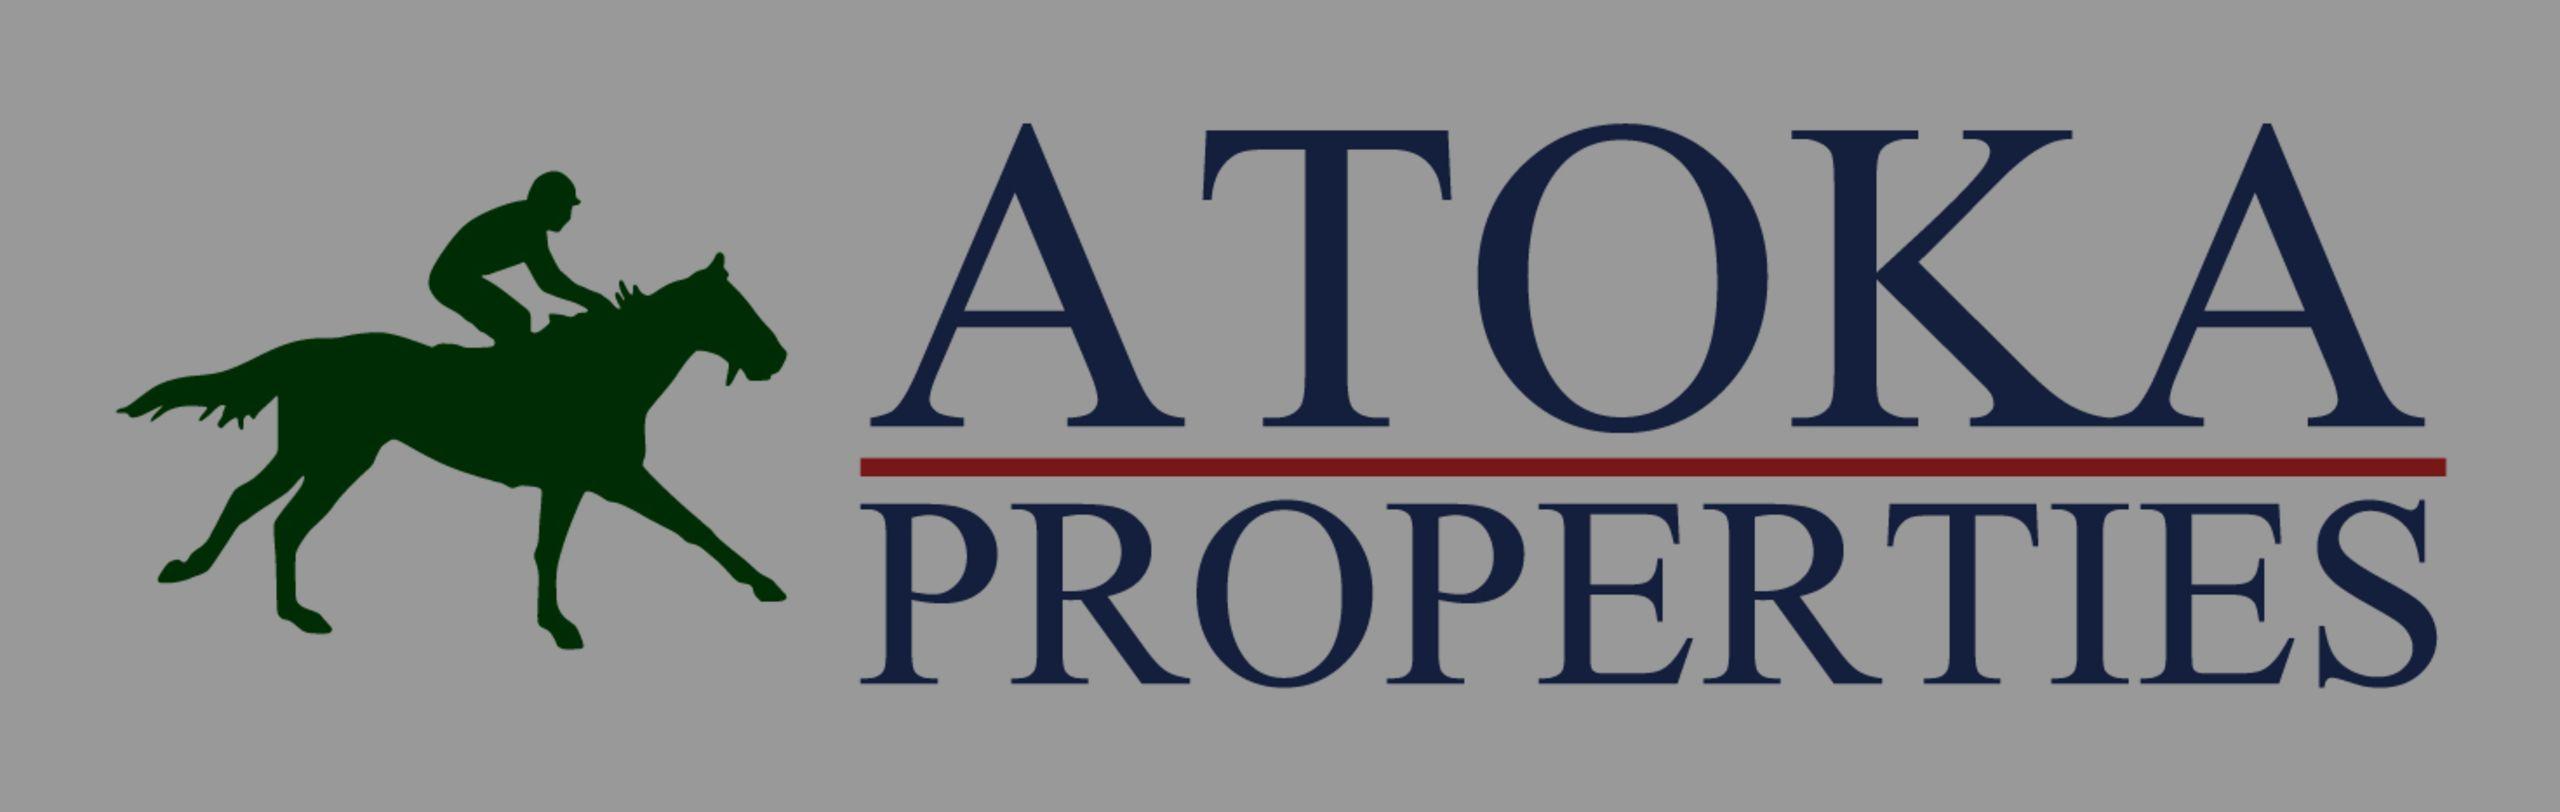 NEW COMMERCIAL AGENTS DAVID HADDOCK & PAUL SMITH JOIN ATOKA PROPERTIES